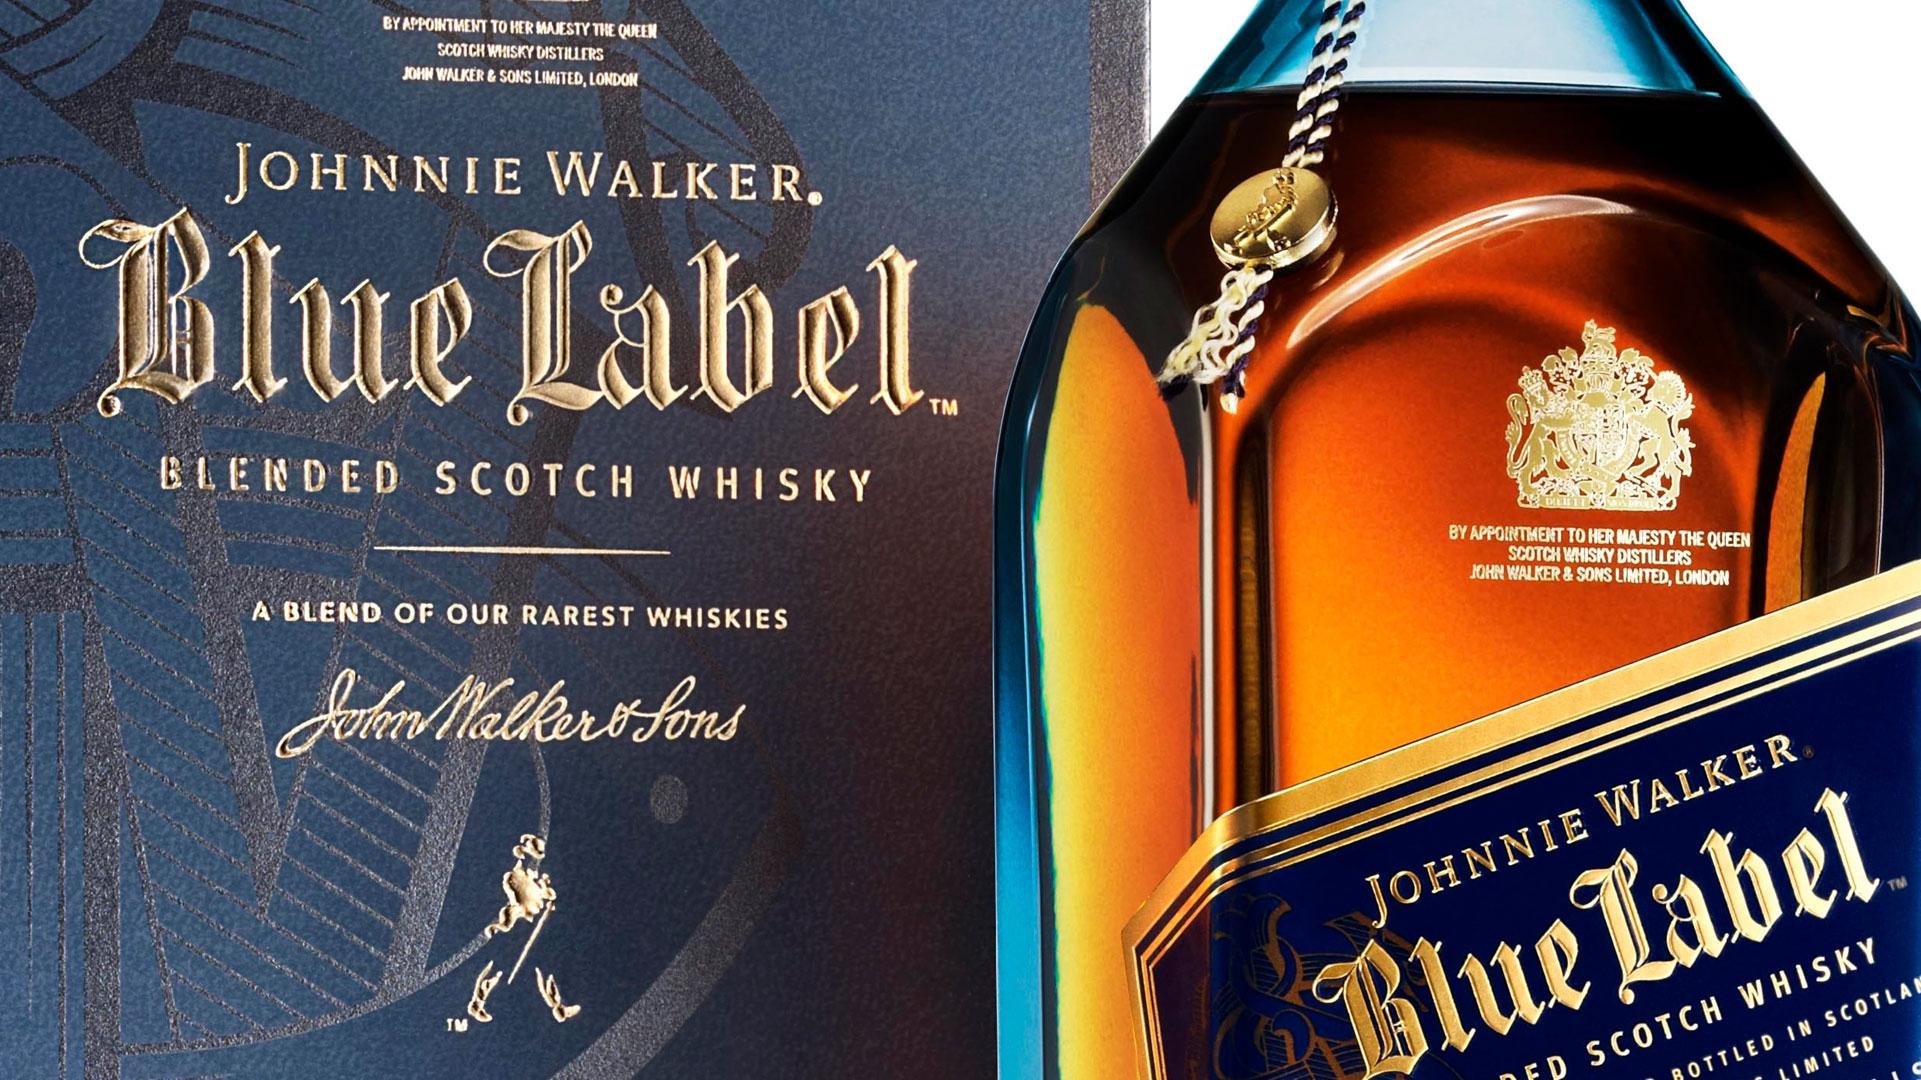 Johnnie Walker Images